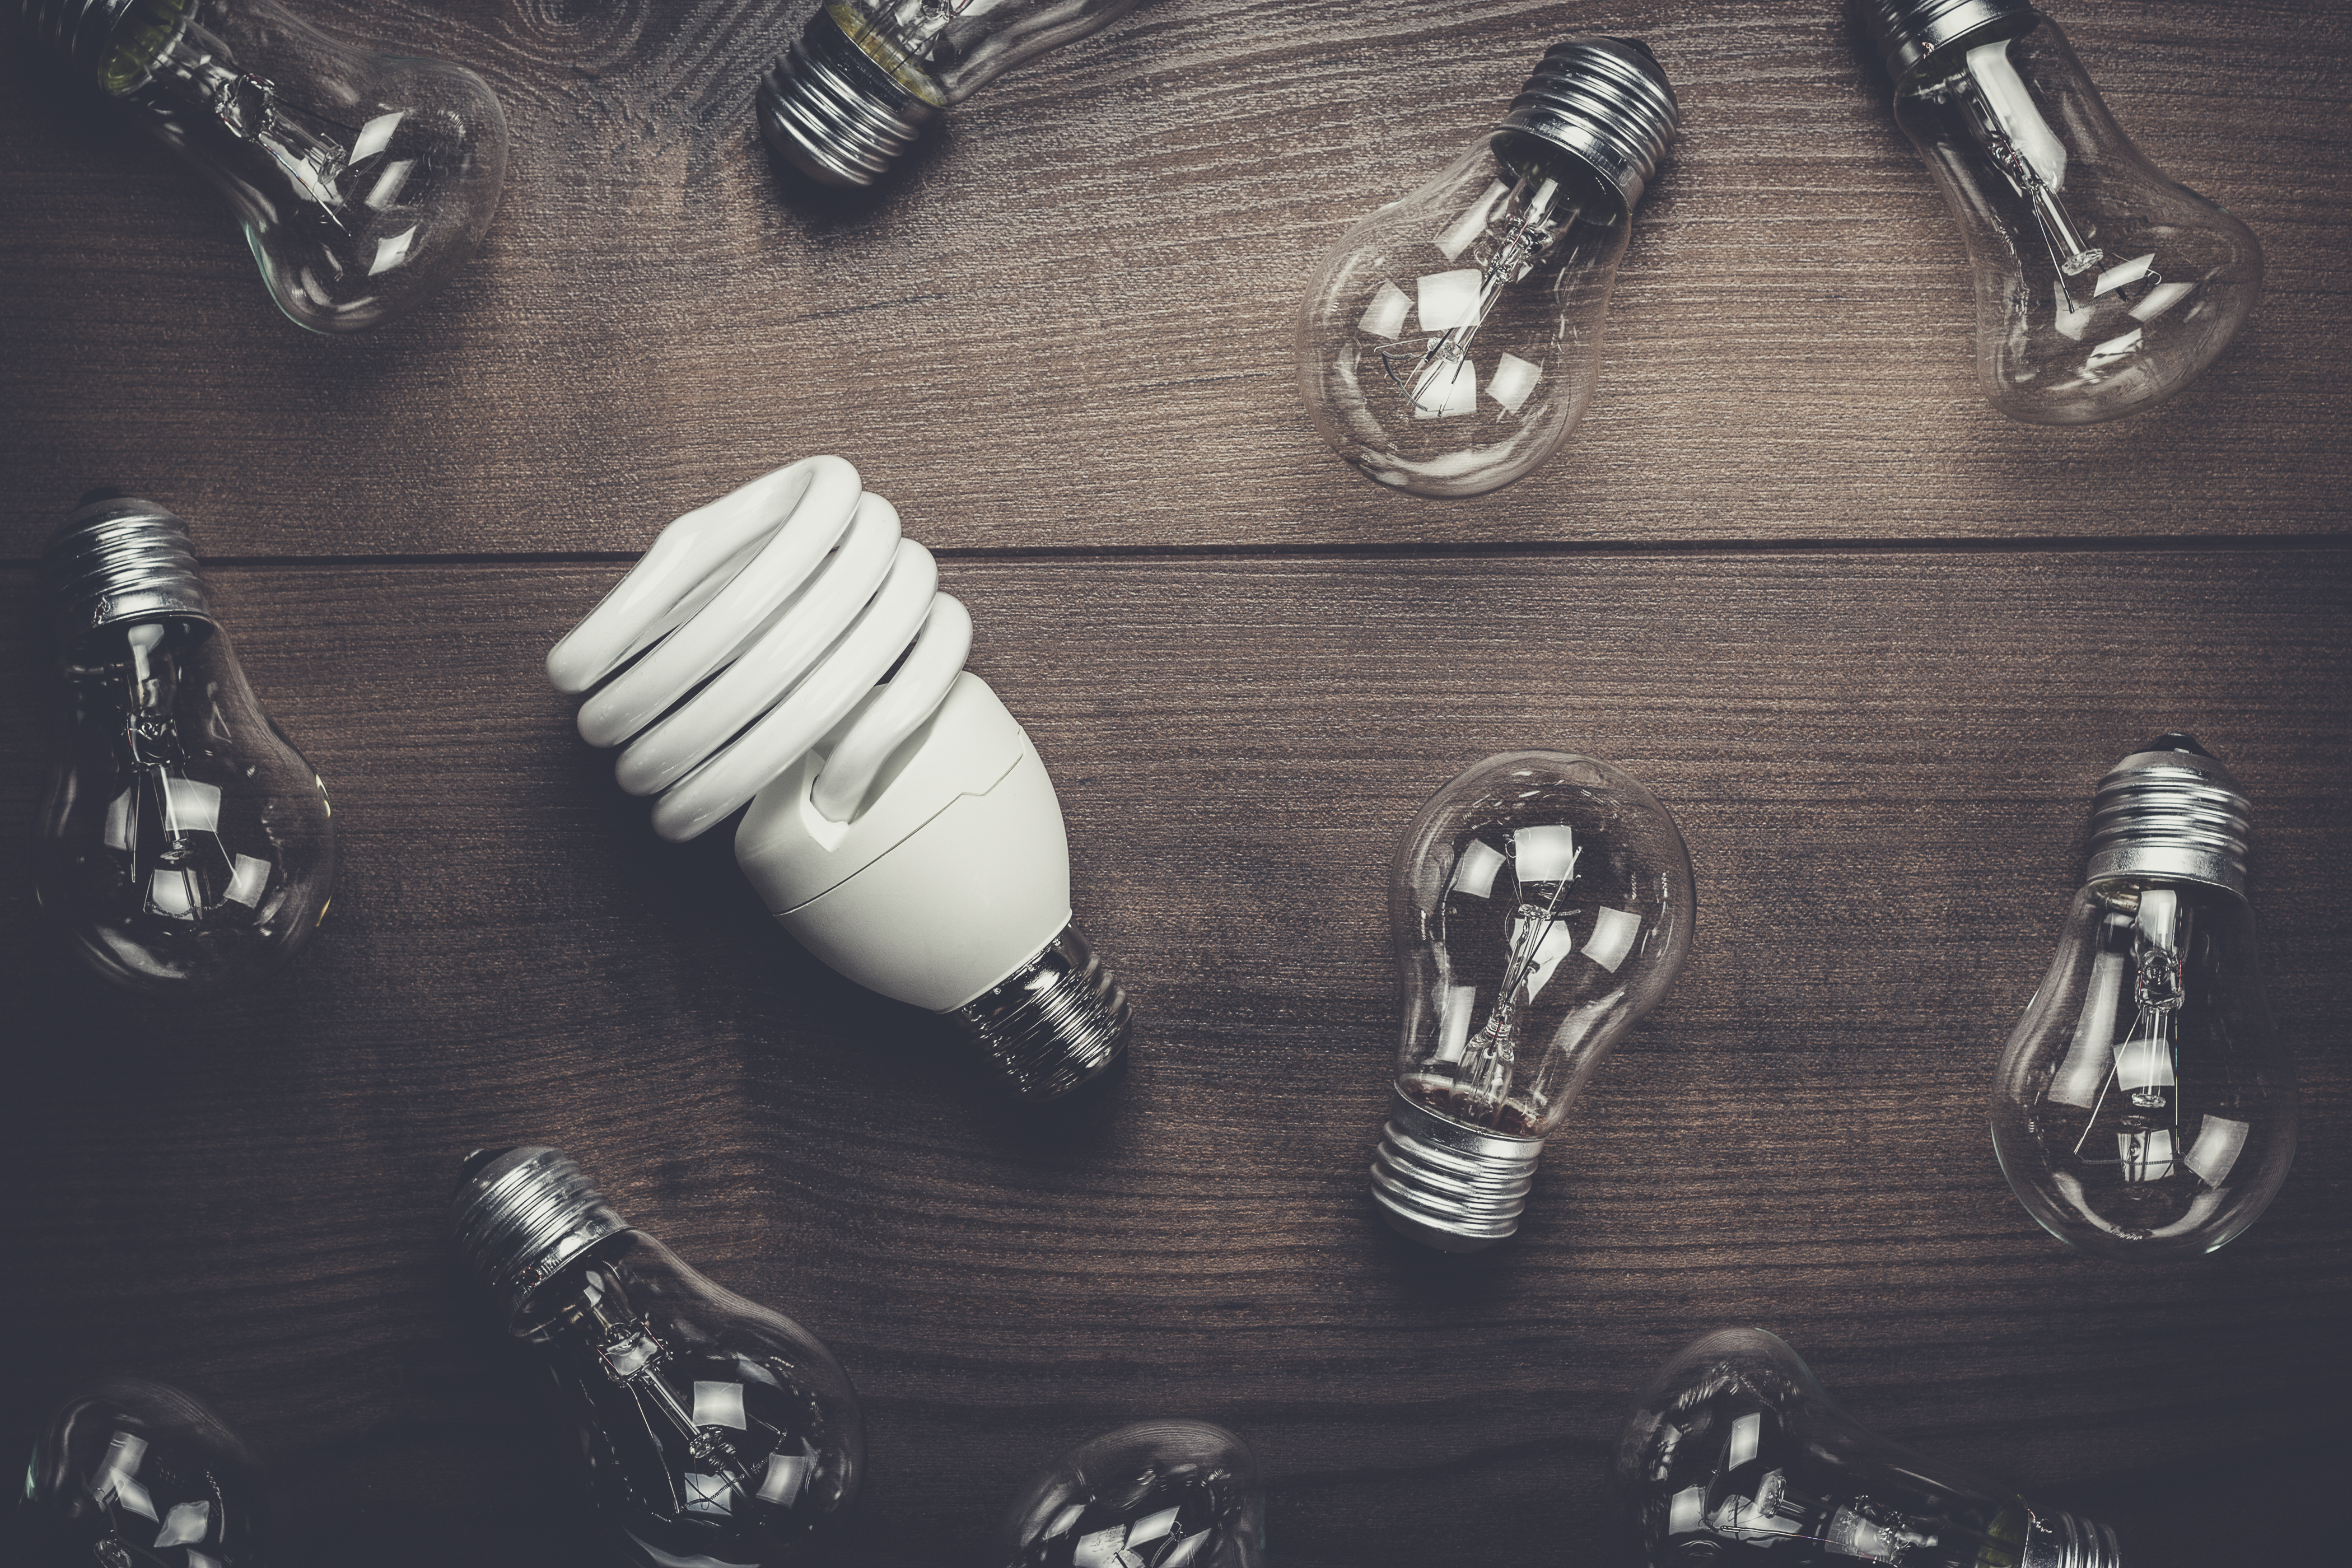 https://watt.co.uk/wp-content/uploads/2020/04/bulb-uniqueness-concept-PCKZW4V.jpg